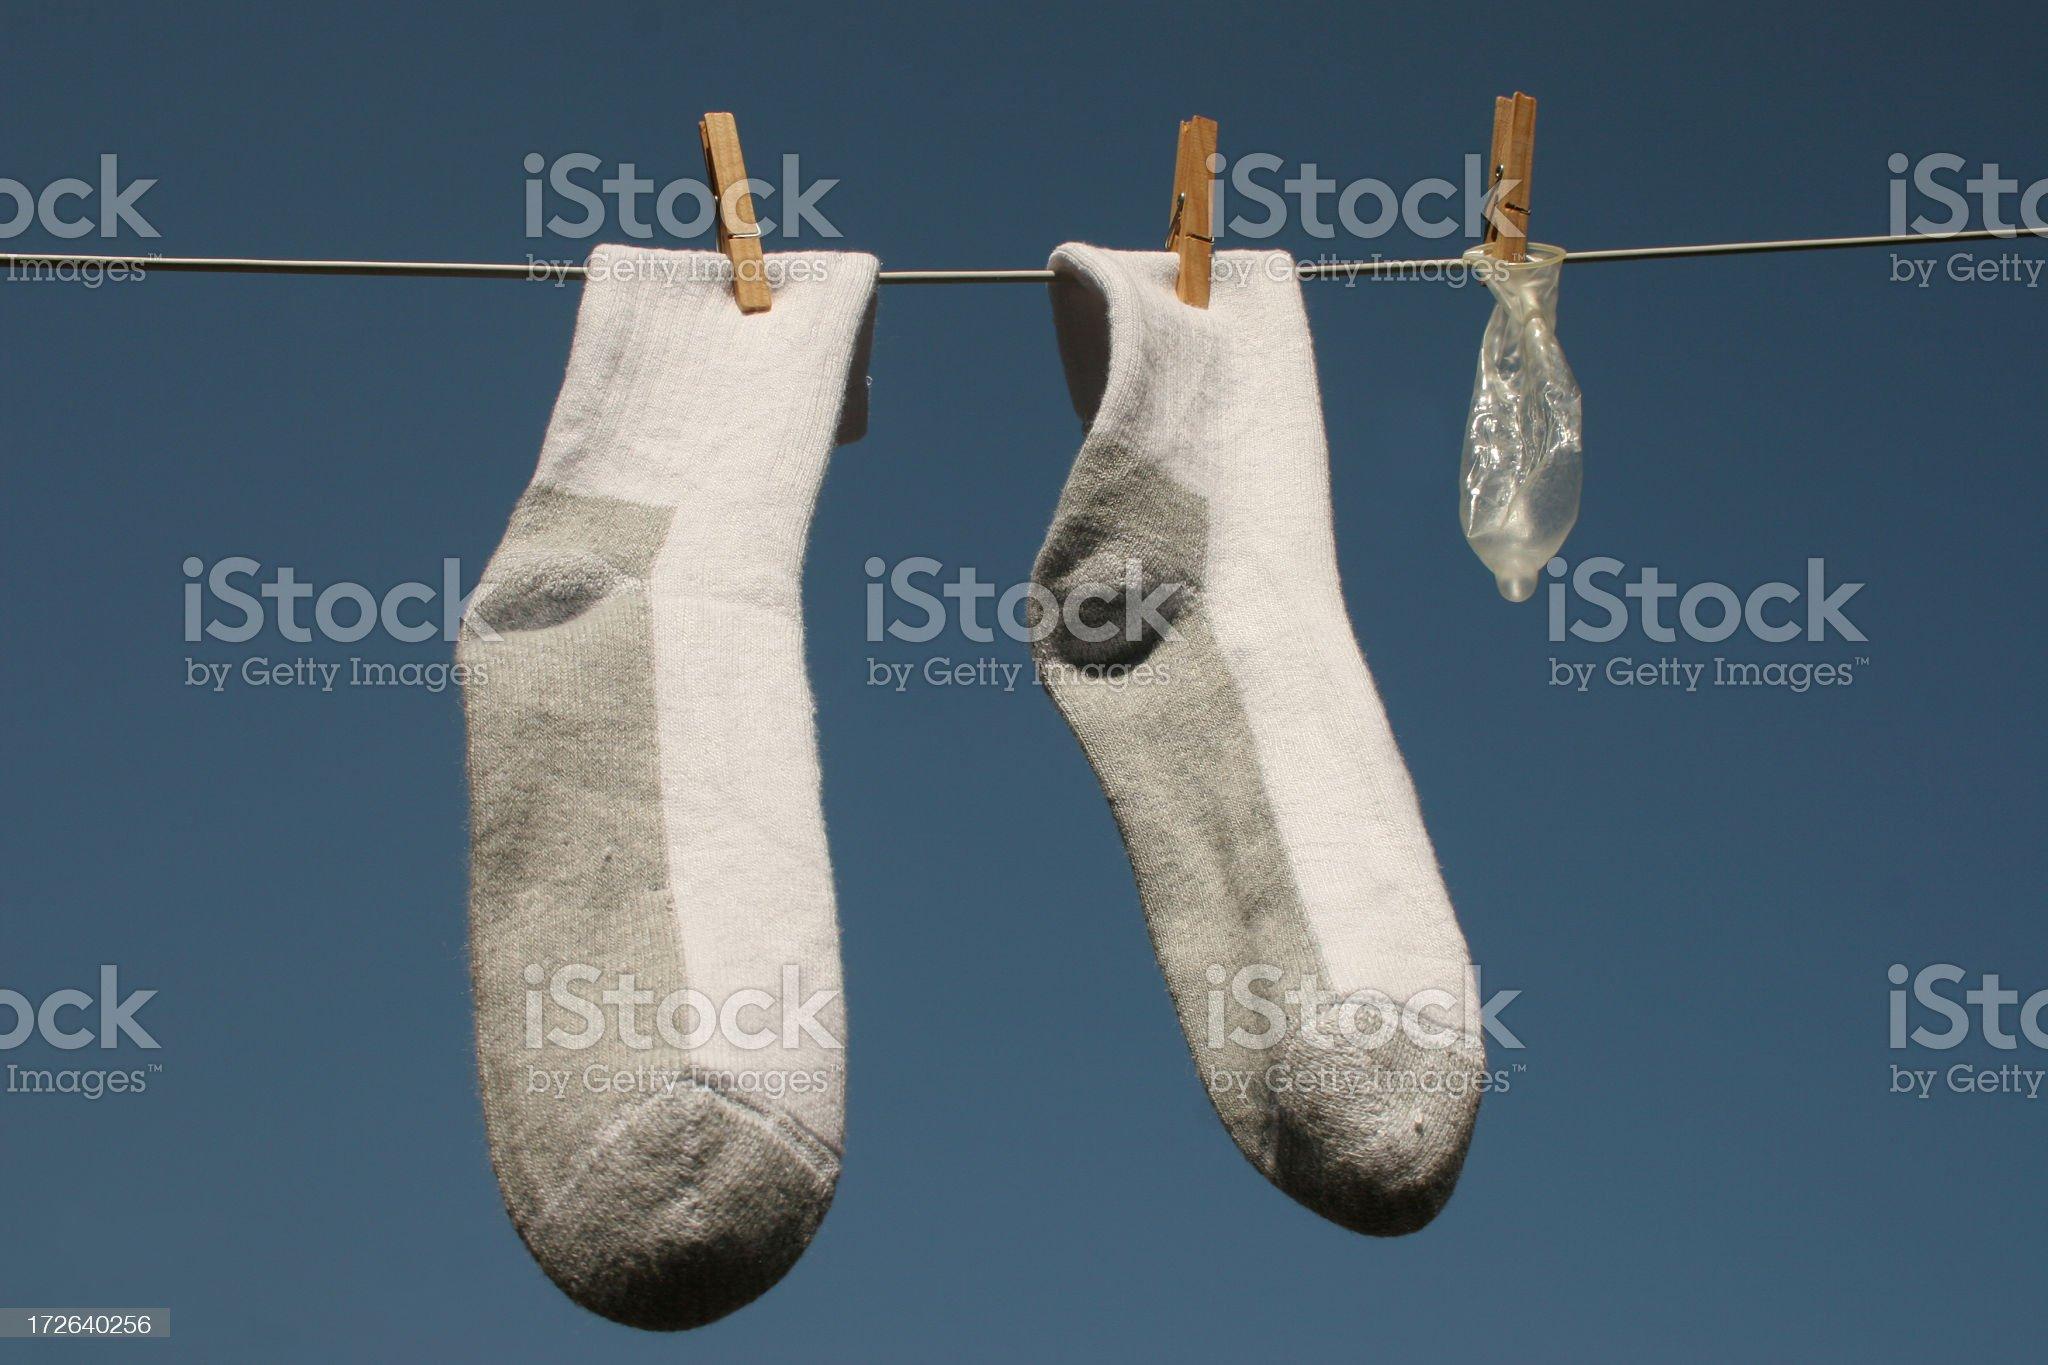 Condom with socks royalty-free stock photo